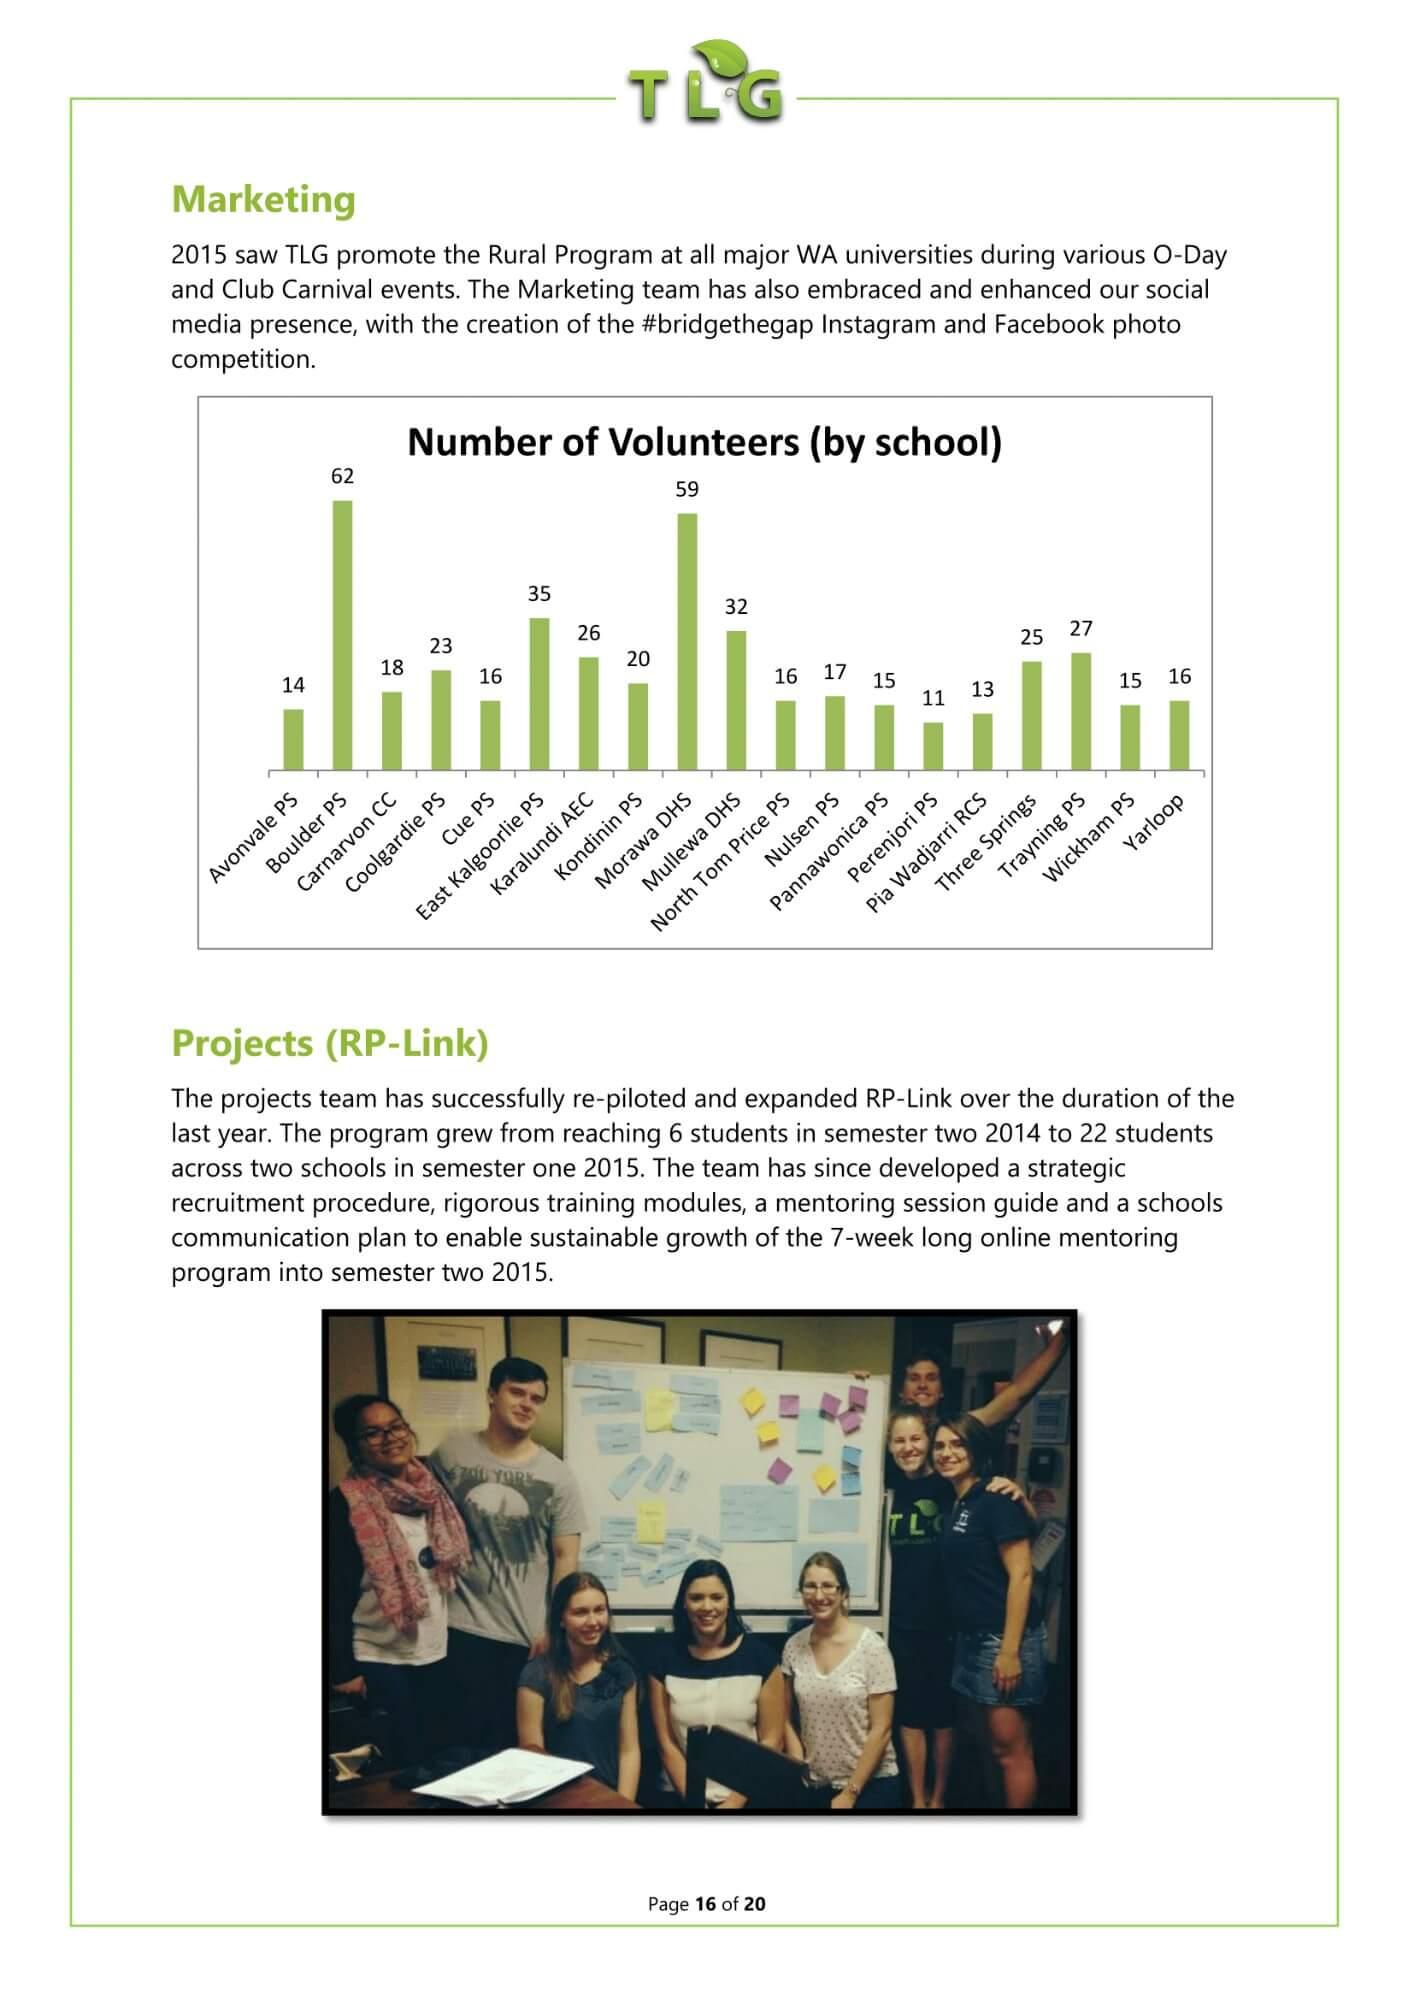 tlg-annual-report-FY14-16.jpg